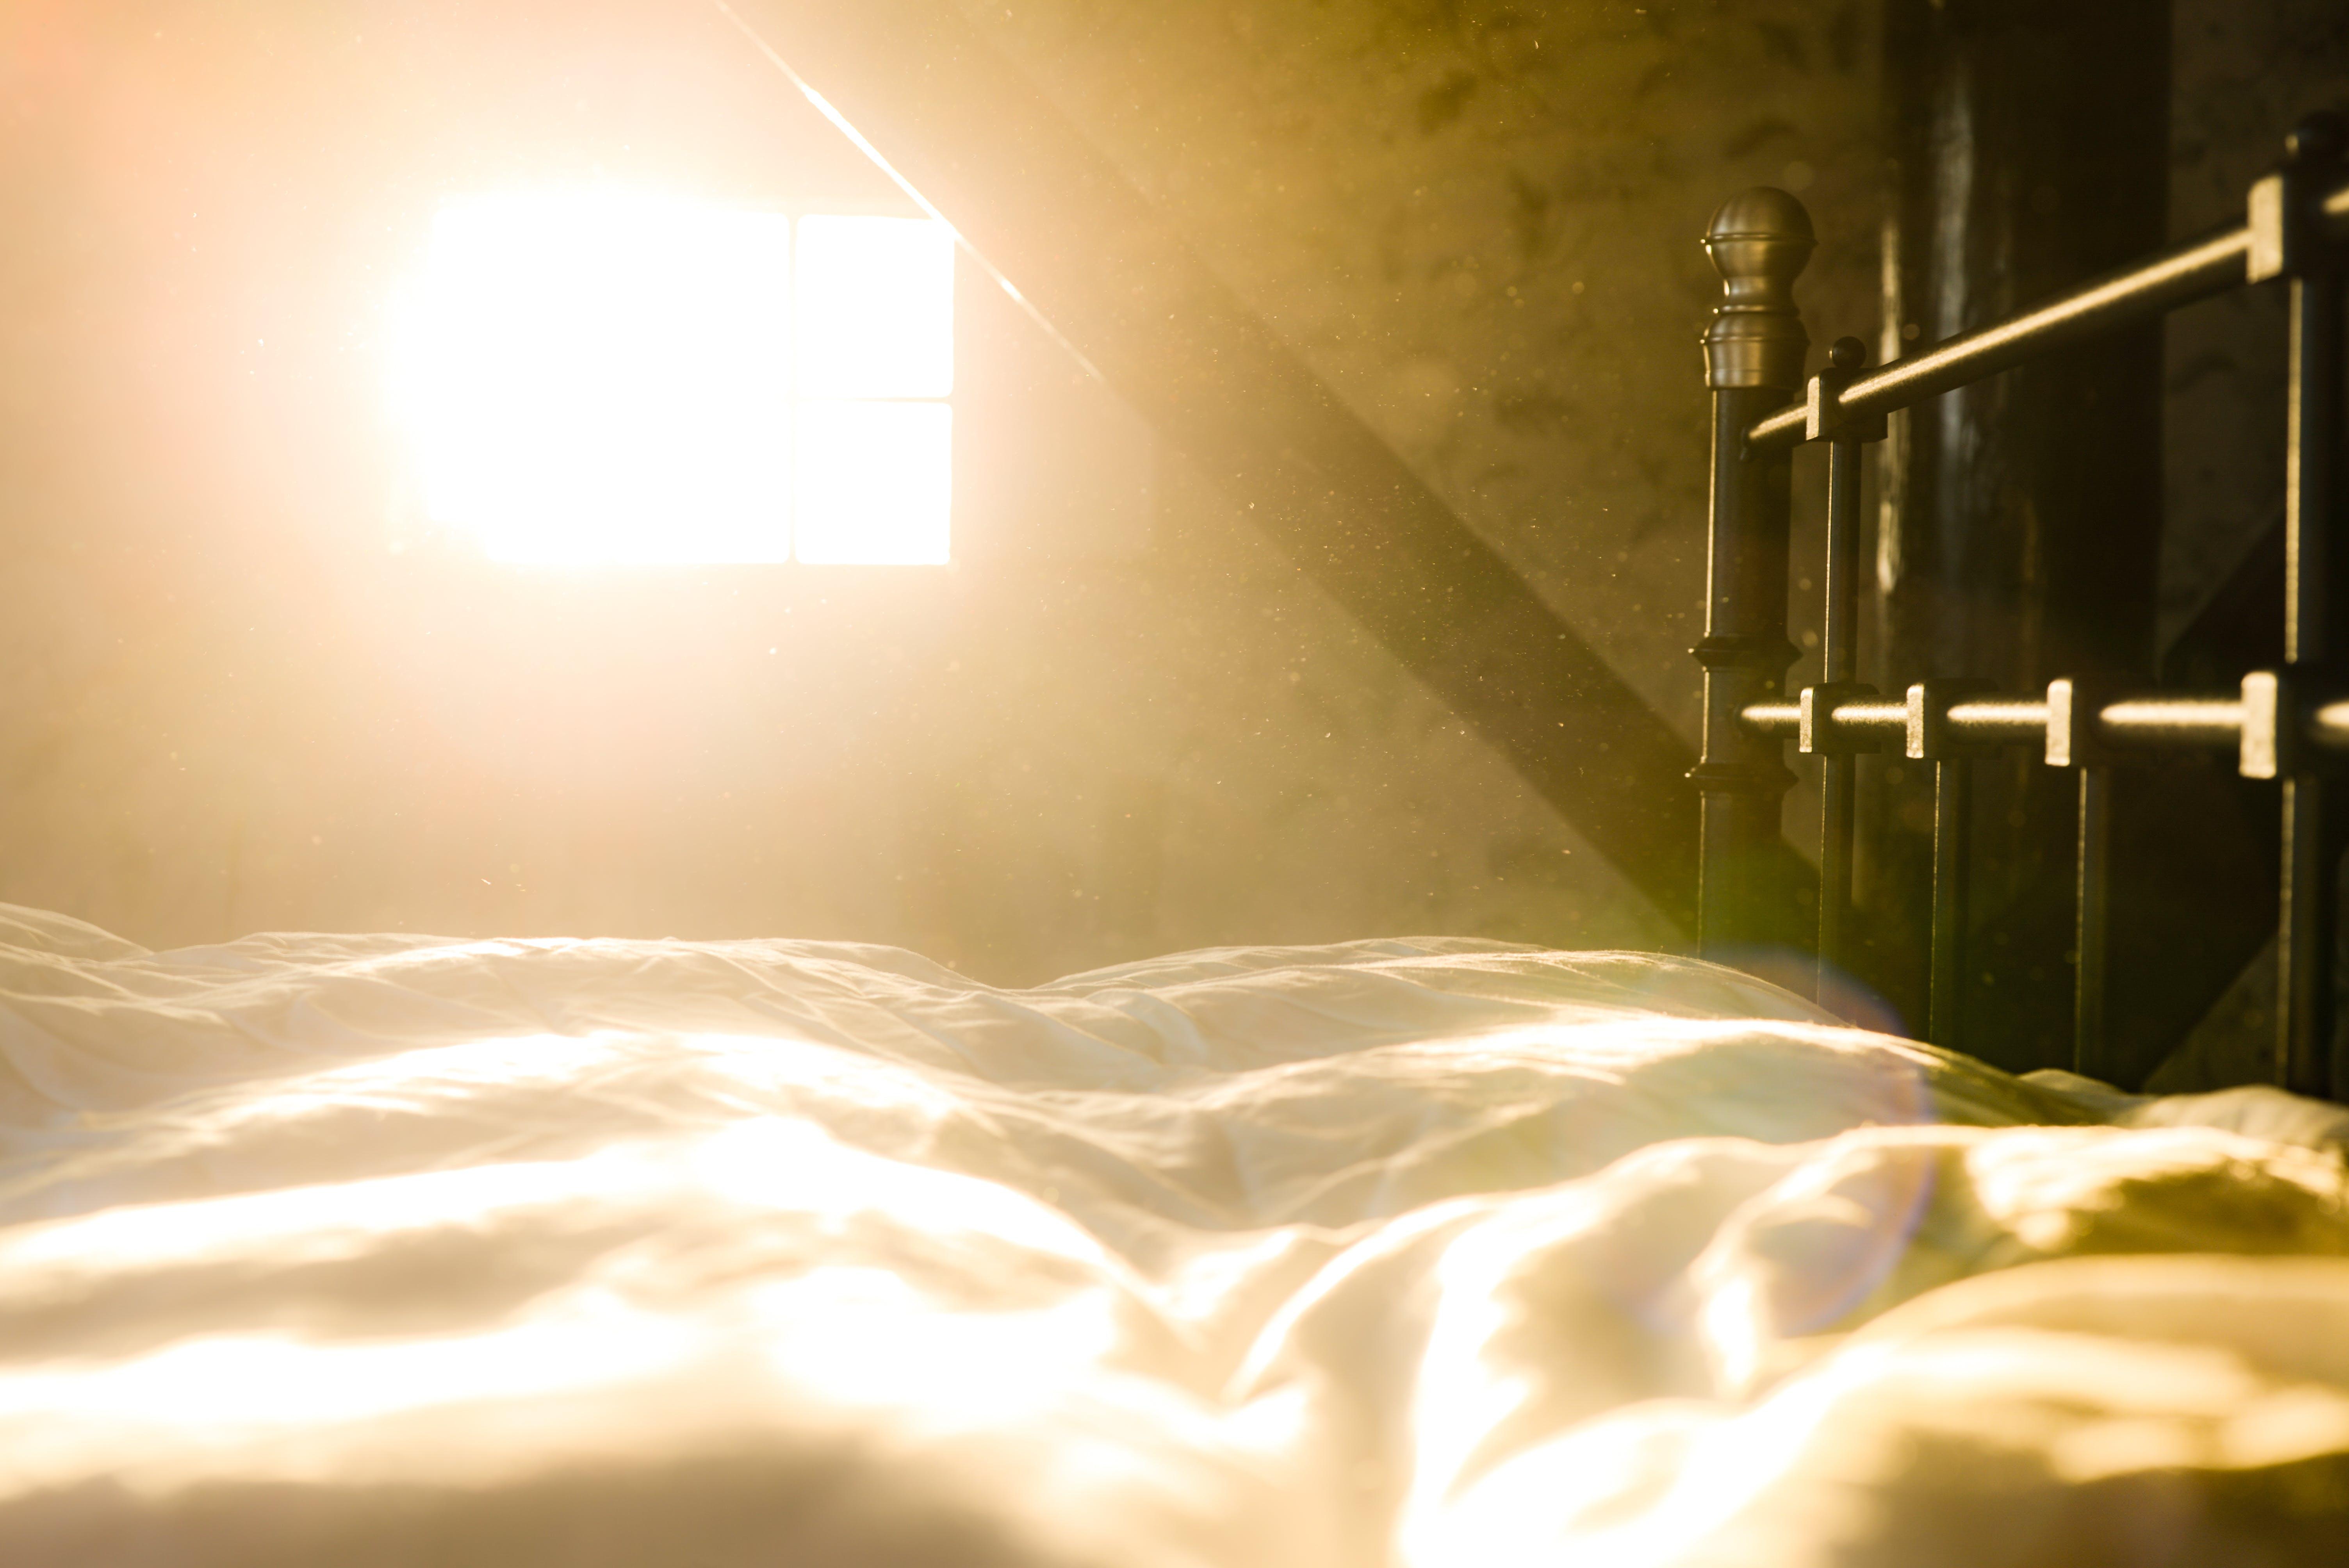 Free stock photo of light, sun, bed, bedroom